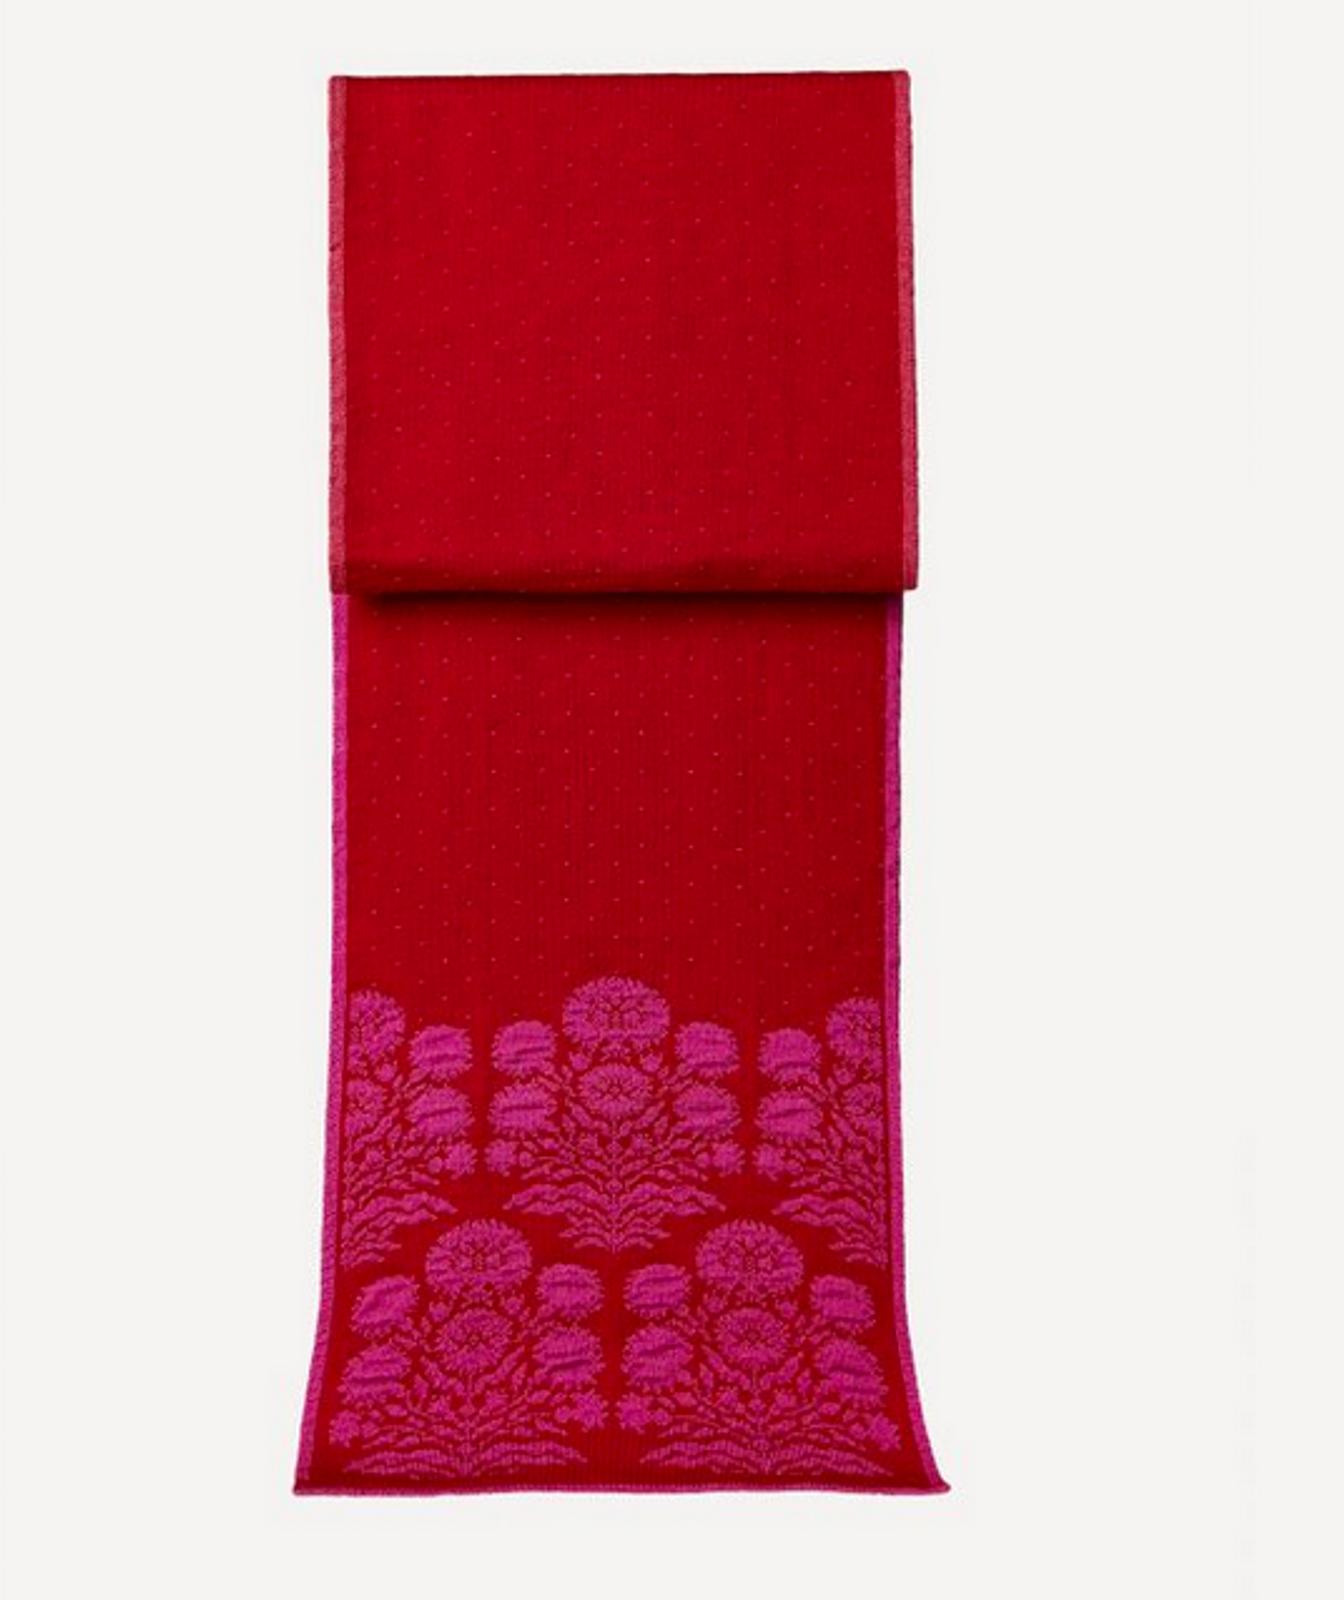 Oleana Alhambra Scarf, 364-R Red (346R)